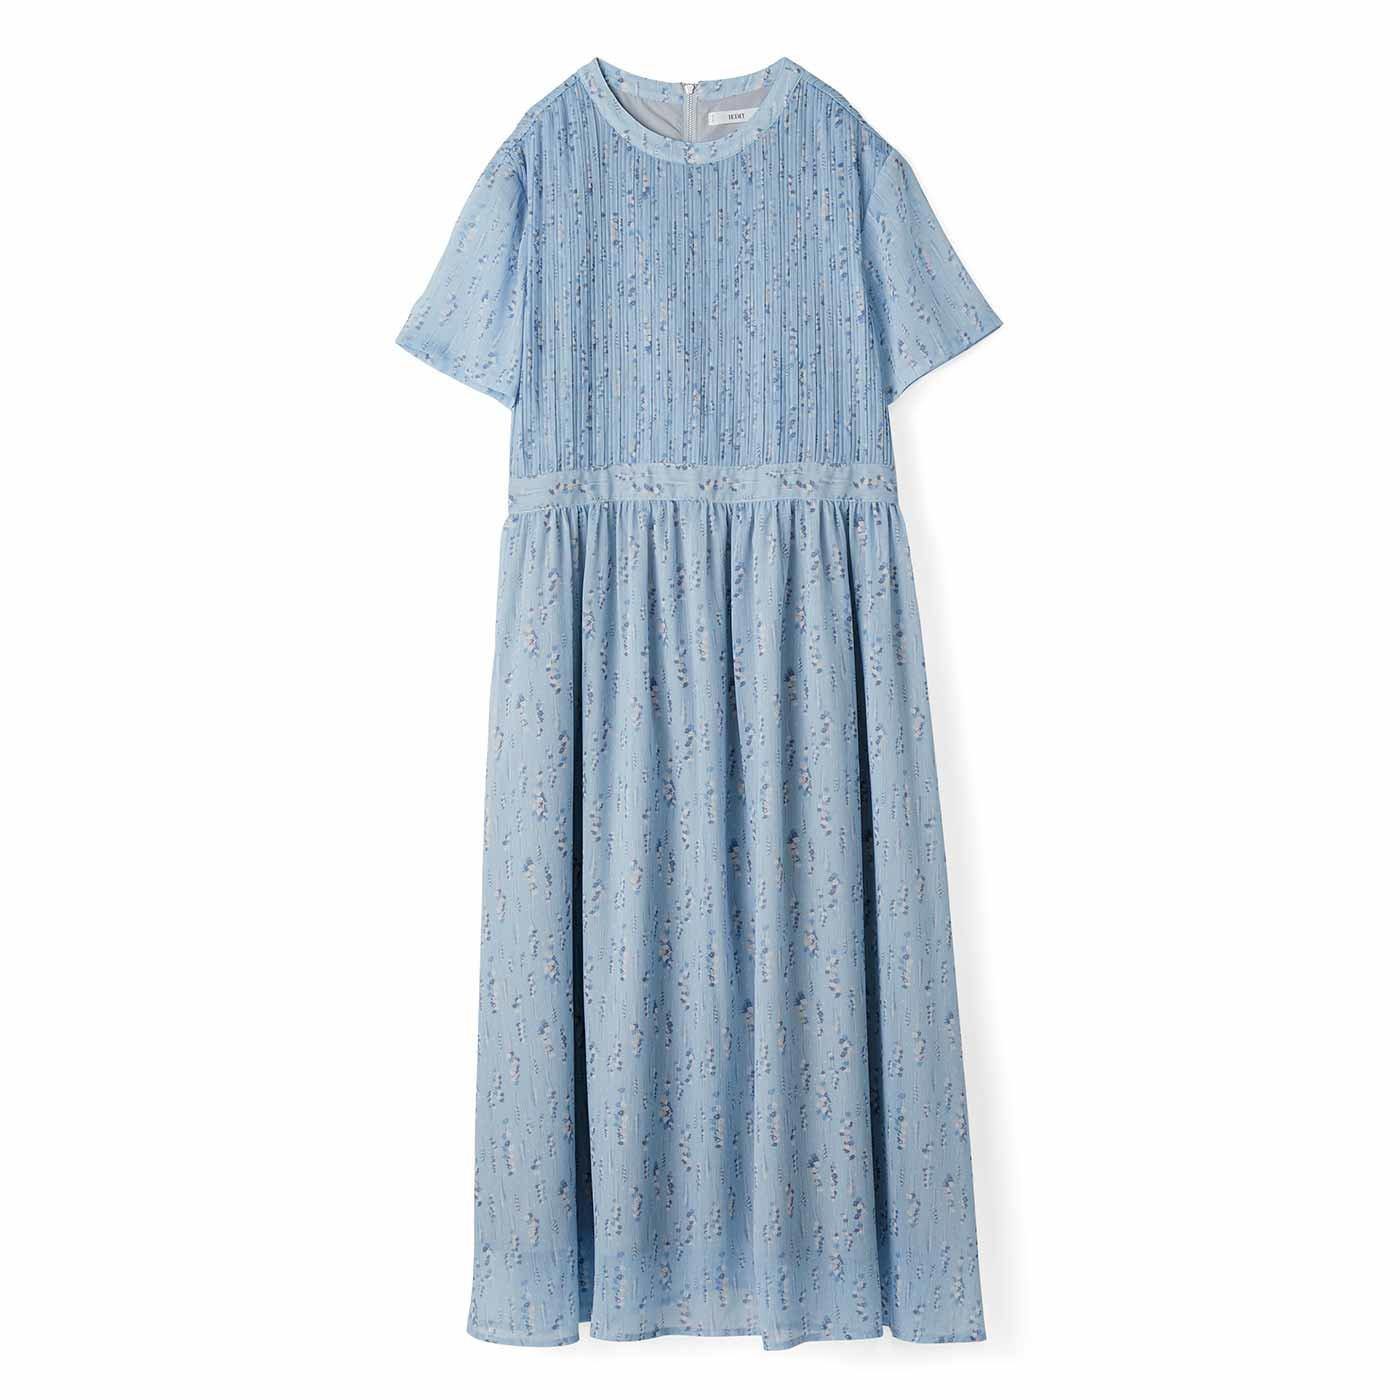 IEDIT[イディット] 楊柳(ようりゅう)シフォン素材のフラワープリントロングワンピース〈ブルー〉